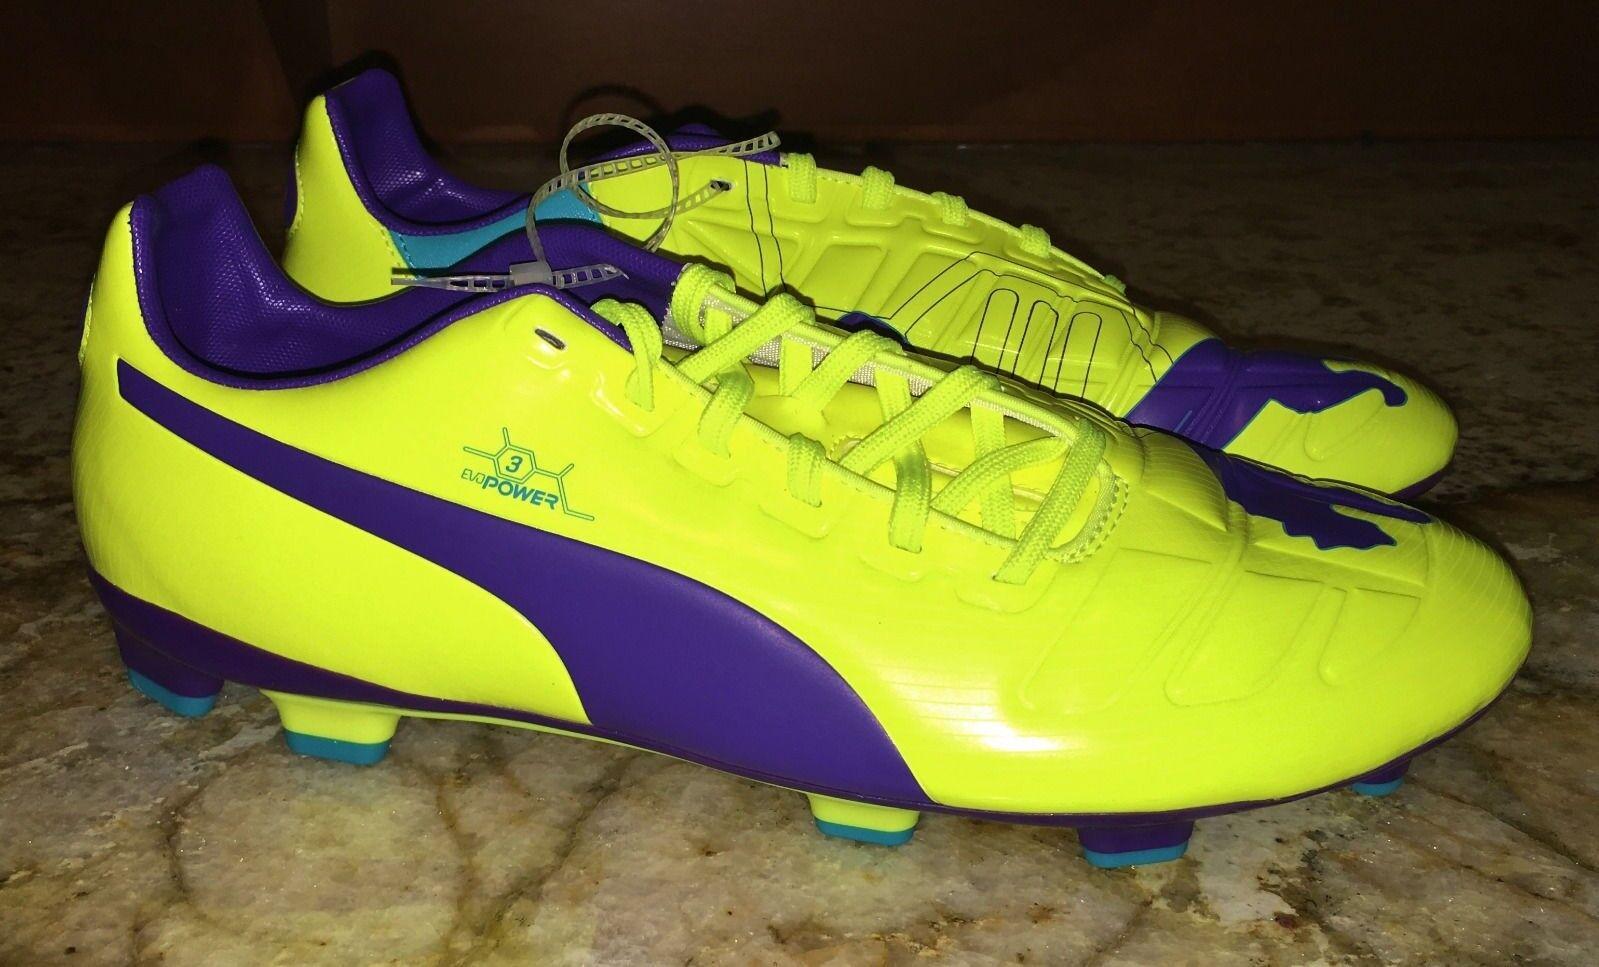 PUMA evoPower 3 Bright Gelb lila Turq Blau FG Soccer Cleats NEW  Herren 11 11.5